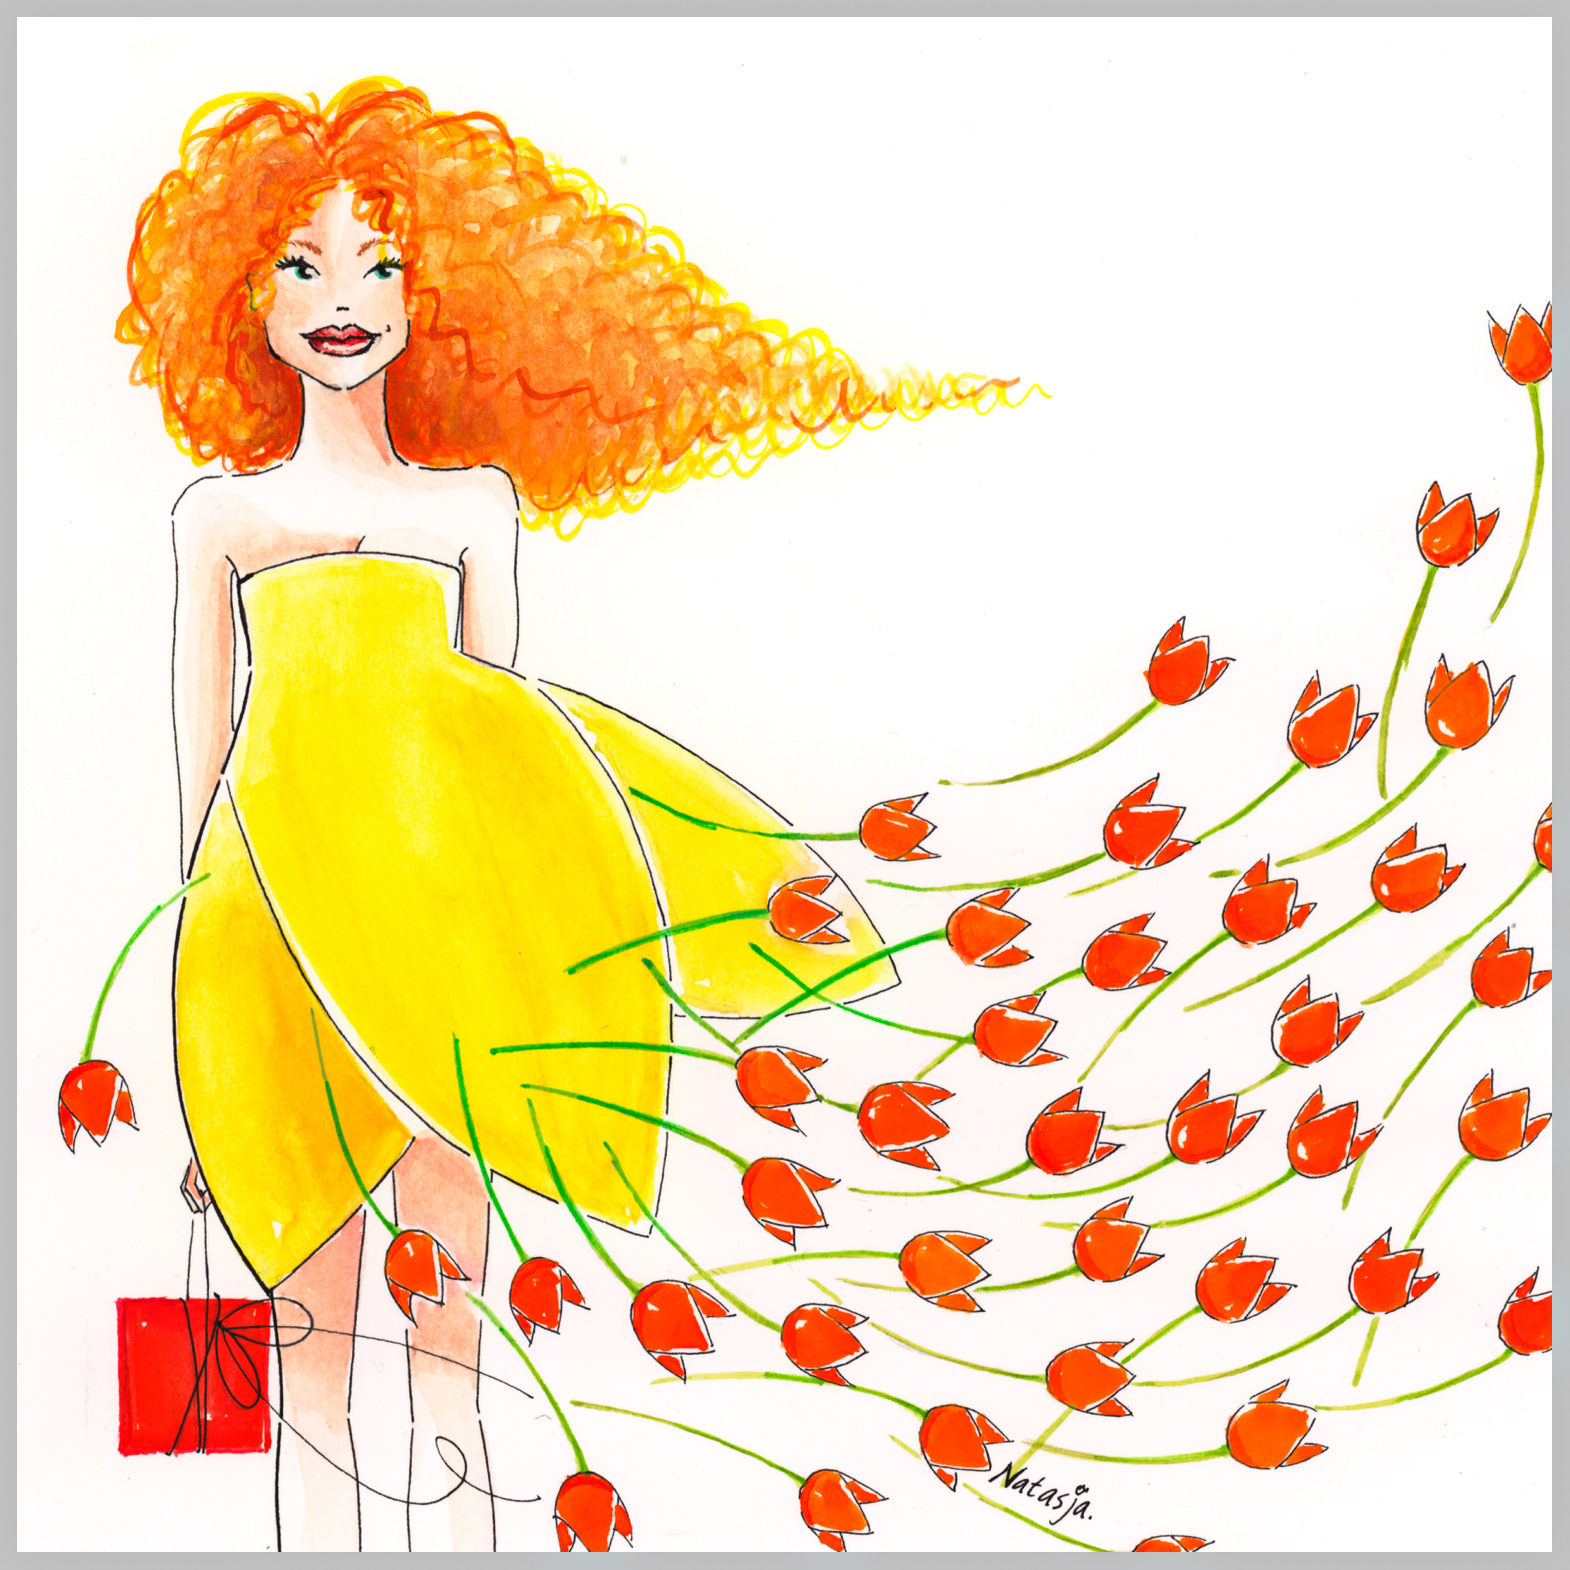 tulpenmeisje met koninginnehaar